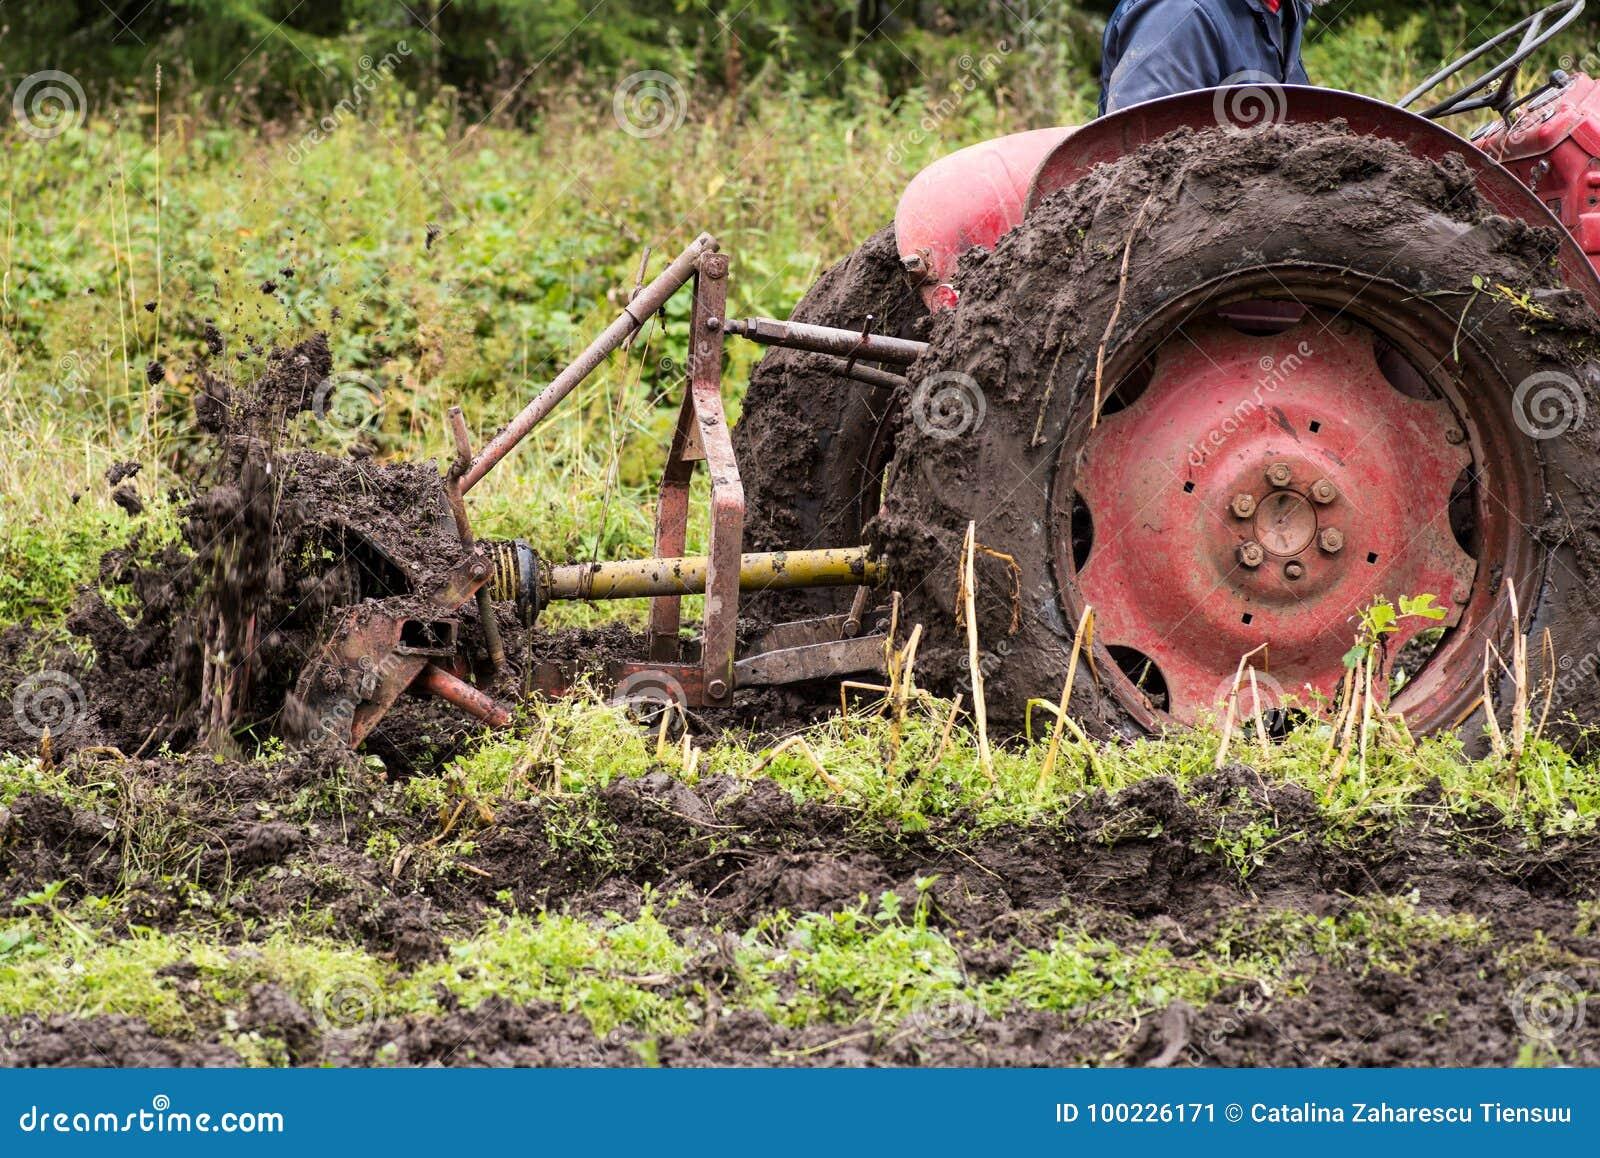 Traktor som klibbas i gyttja